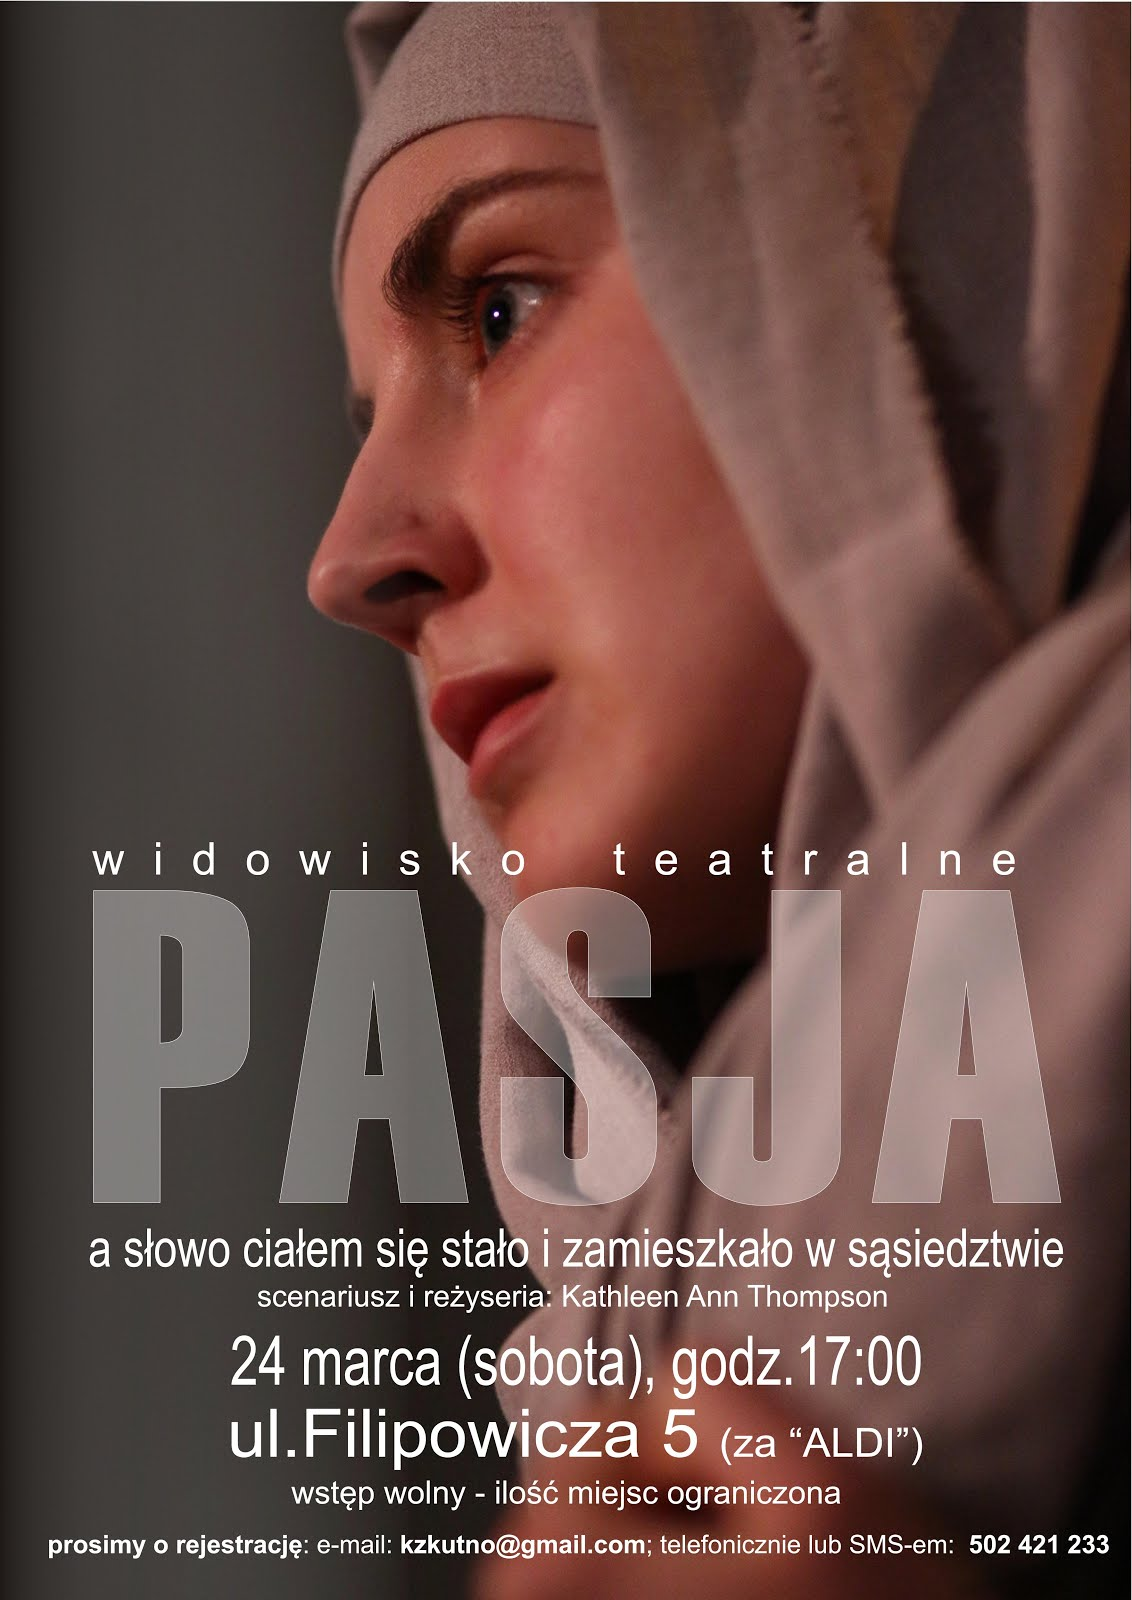 PASJA - WIDOWISKO TEATRALNE